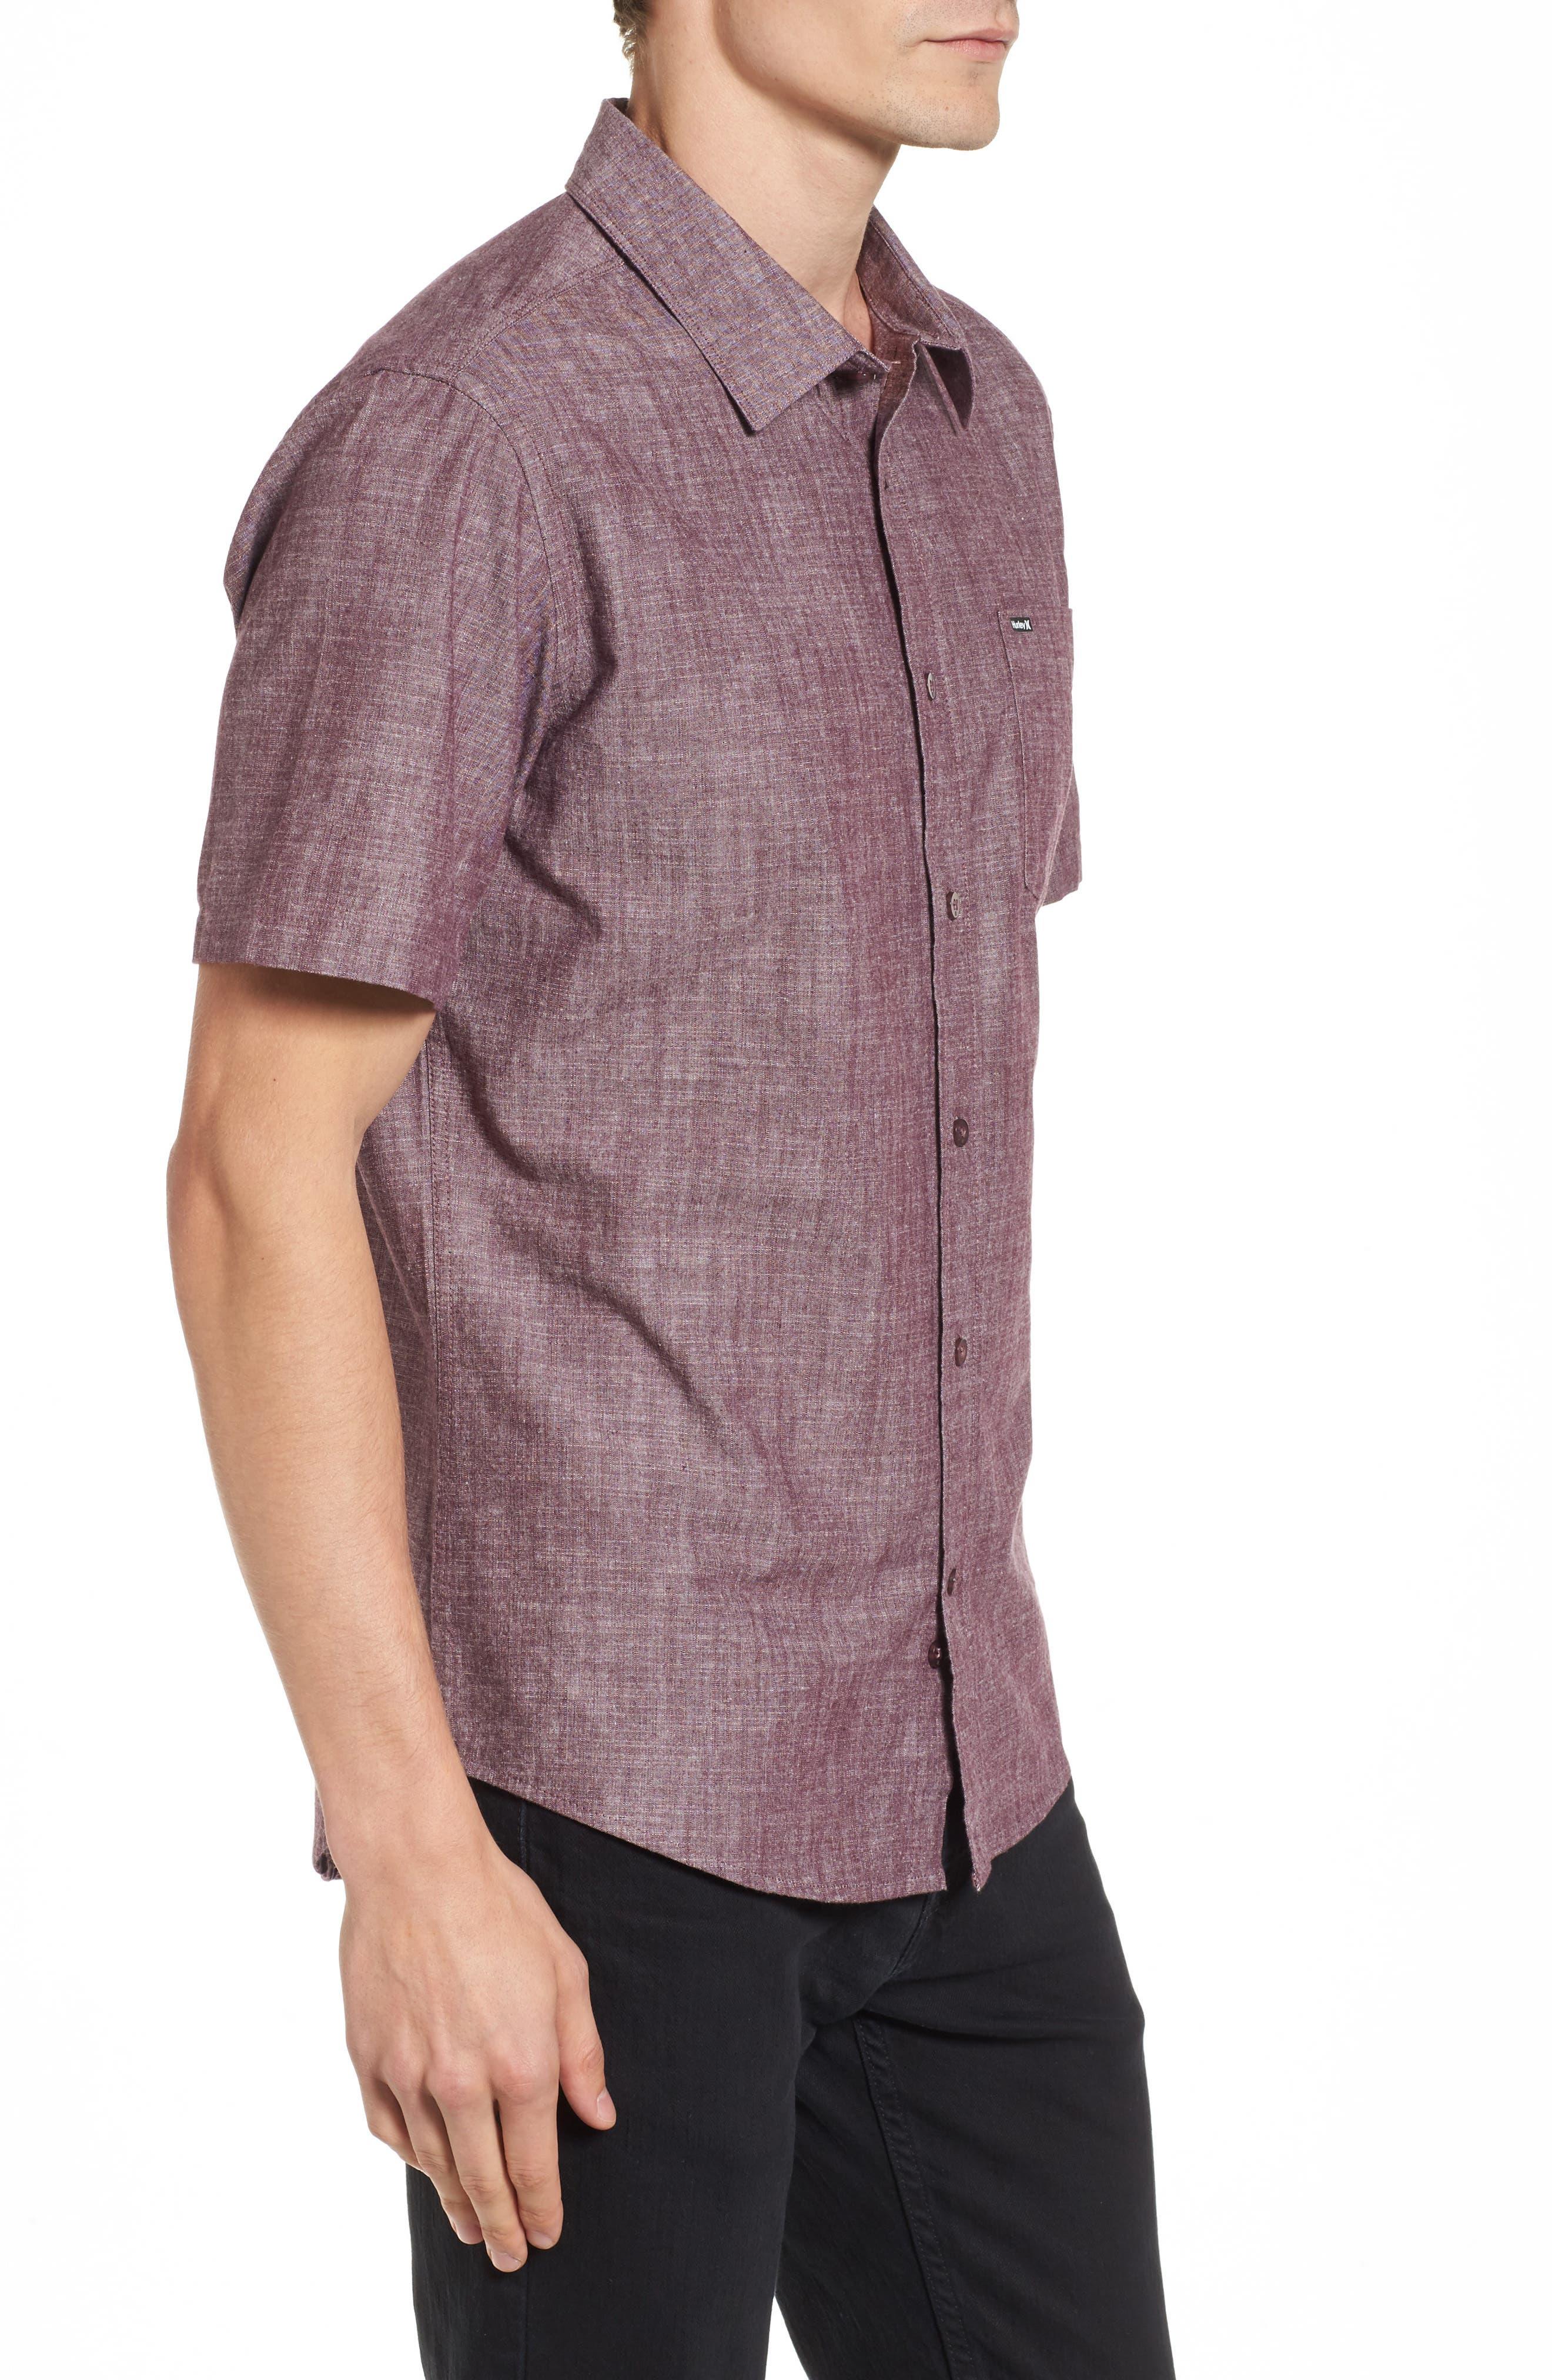 O & O 3.0 Woven Shirt,                             Alternate thumbnail 3, color,                             644